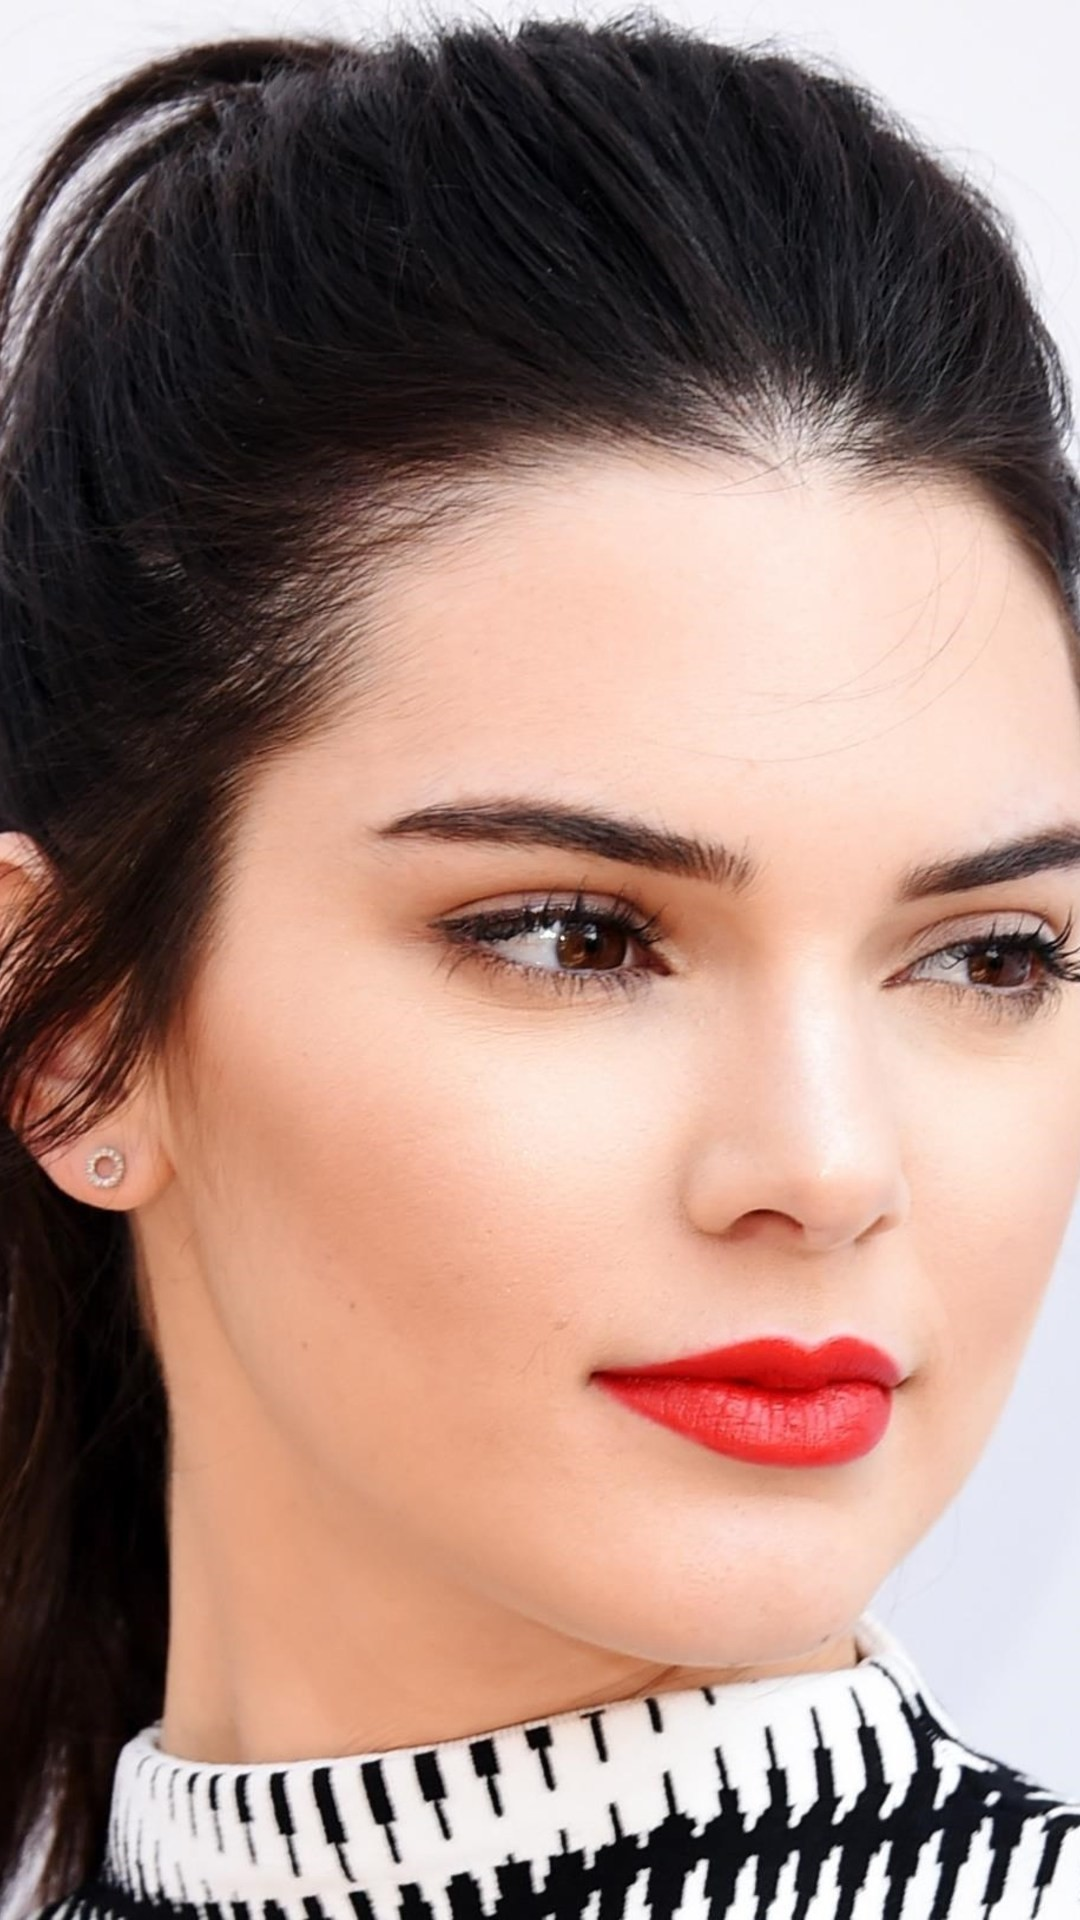 Kendall Jenner iphone 6 wallpaper